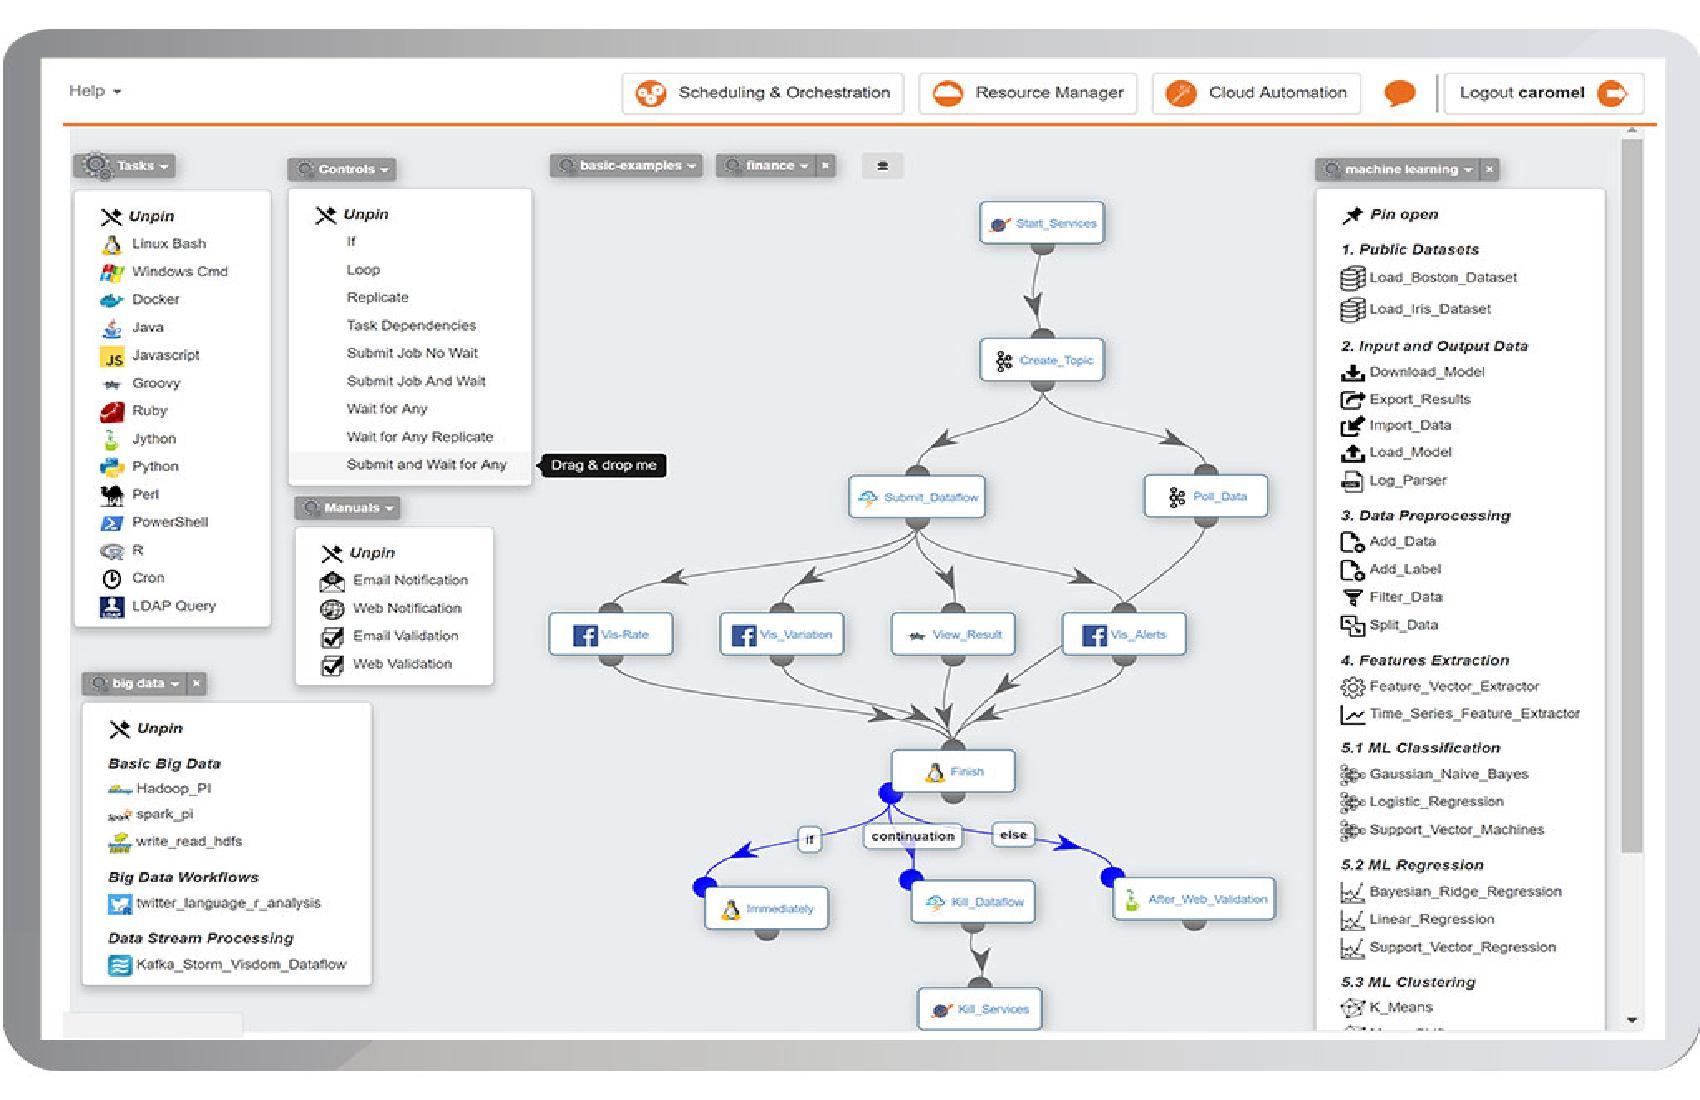 images/product-screenshots/proactive-big-data-workflow-frame.jpg